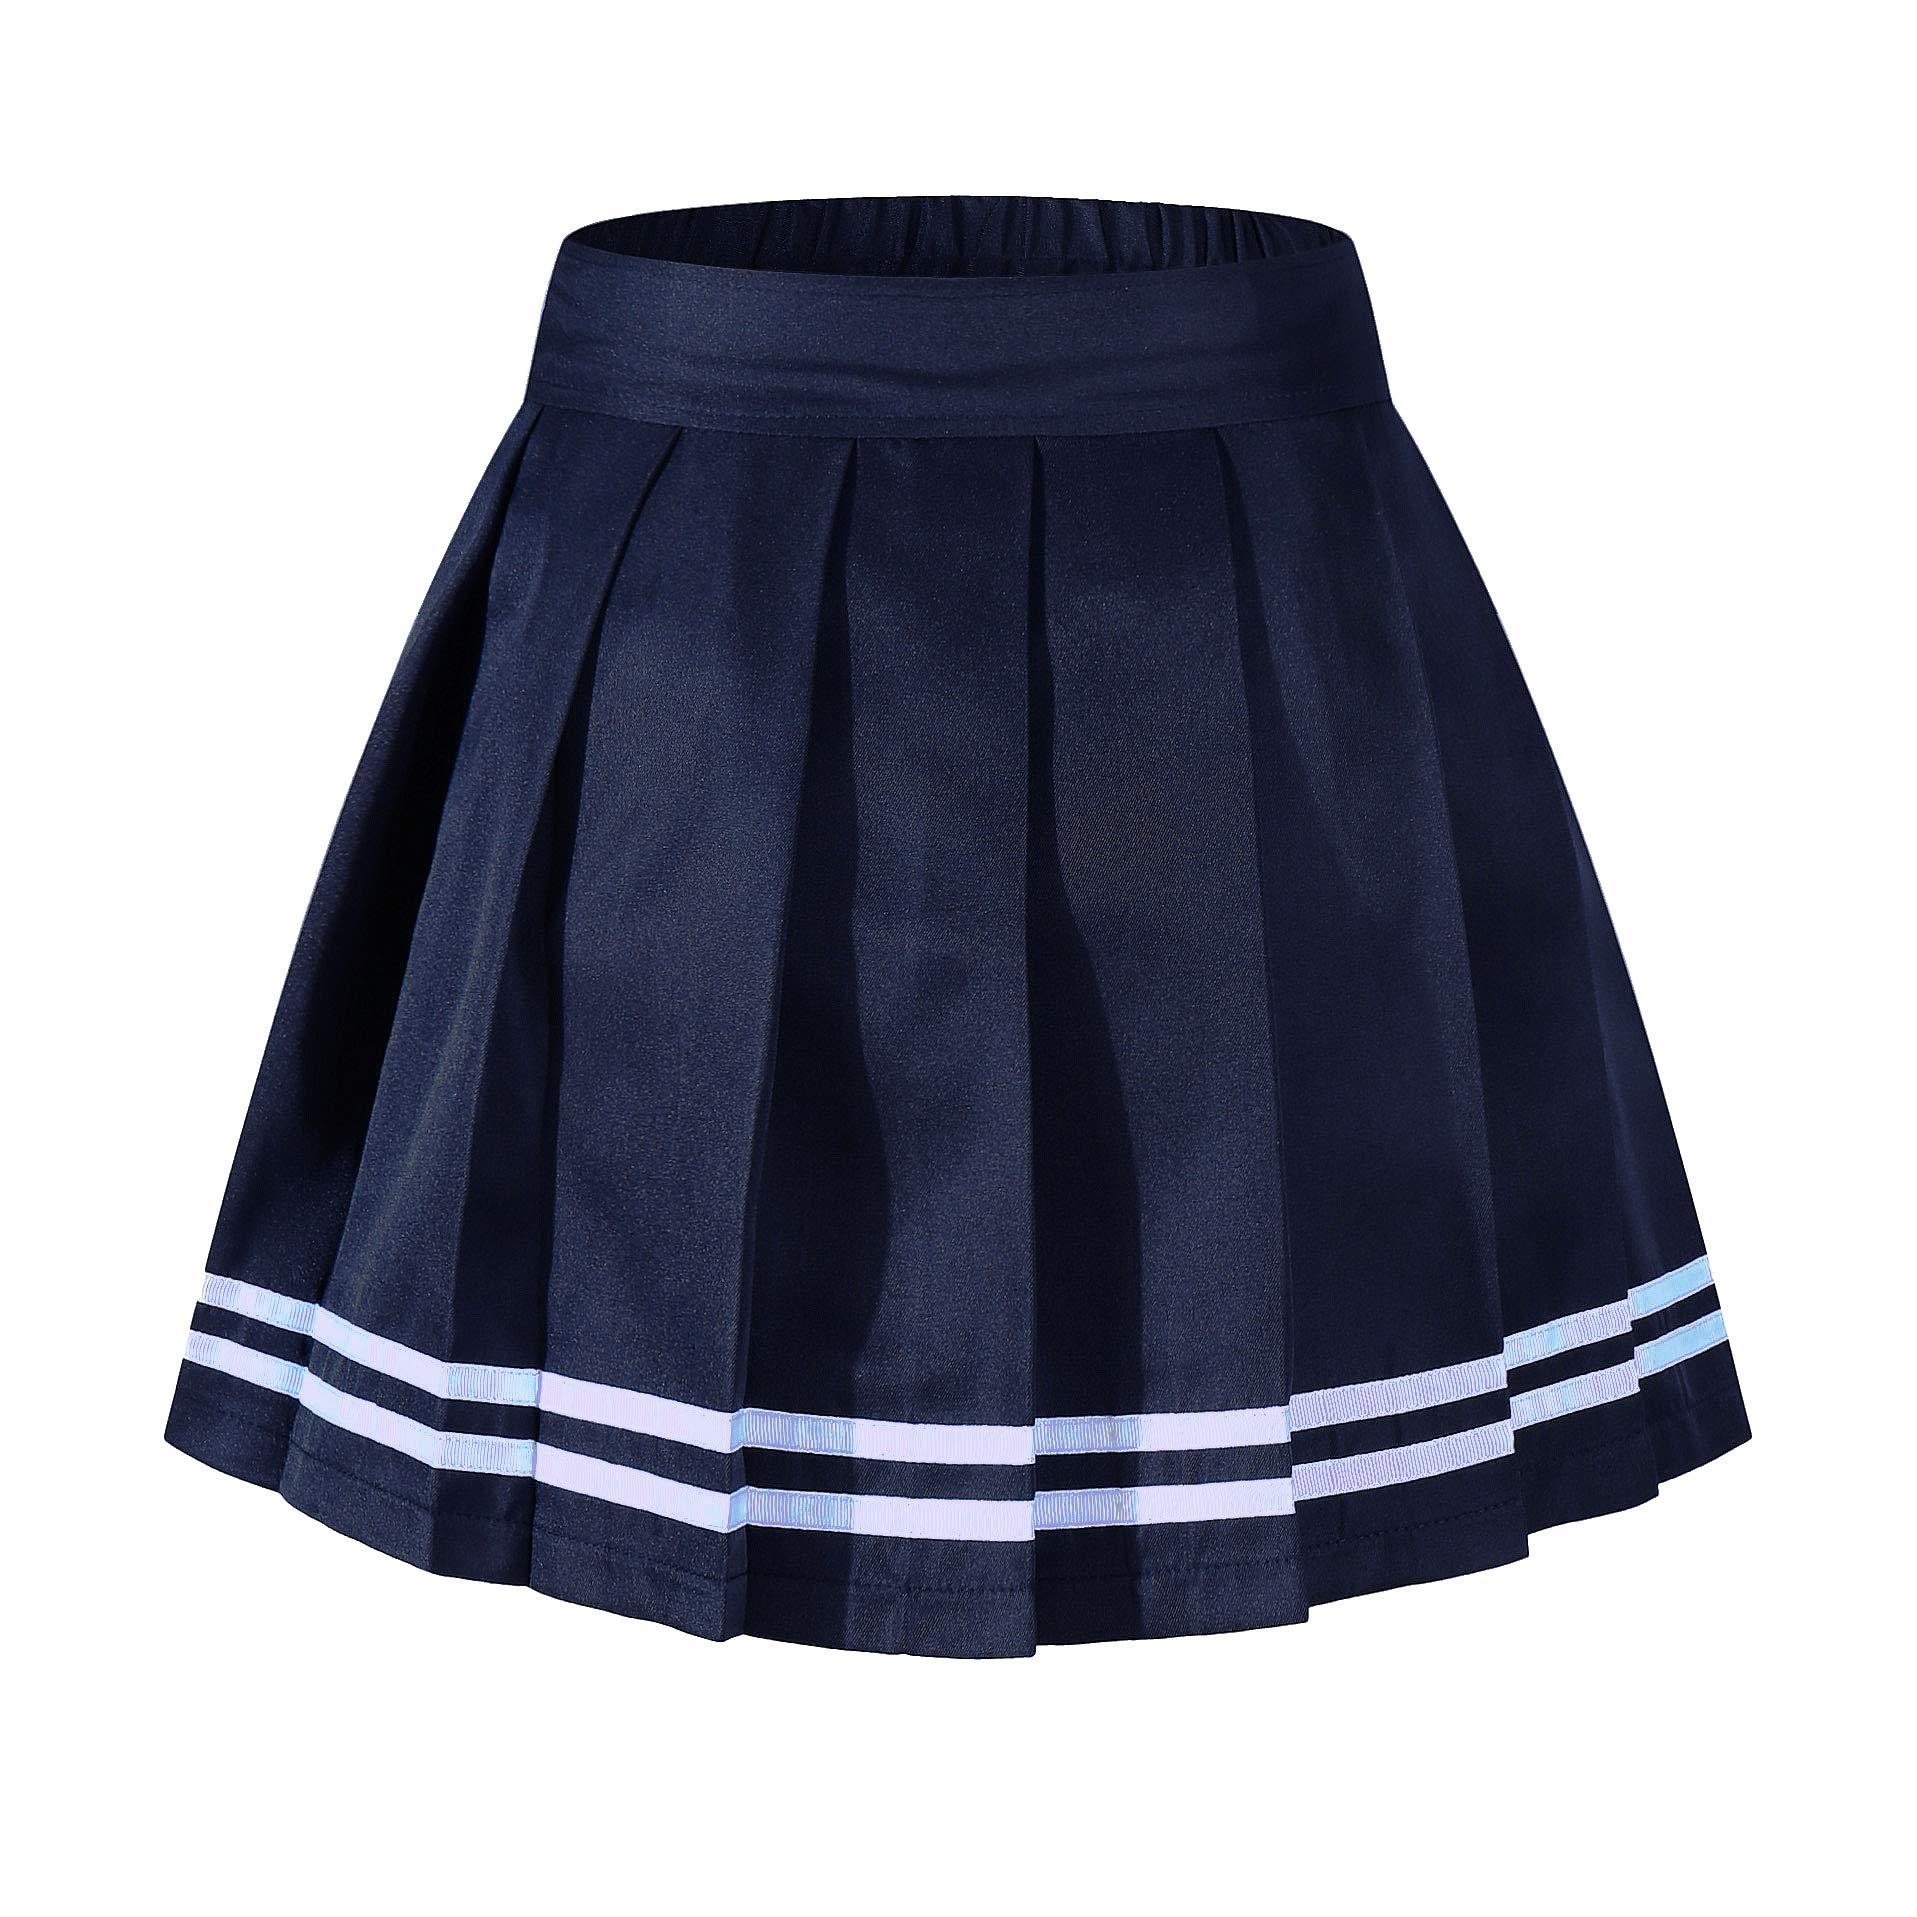 Beautifulfashionlife Girl's High Waist Pleated Mini Skirt Tennis A-line Elastic Shorts Navy White Stripes,S